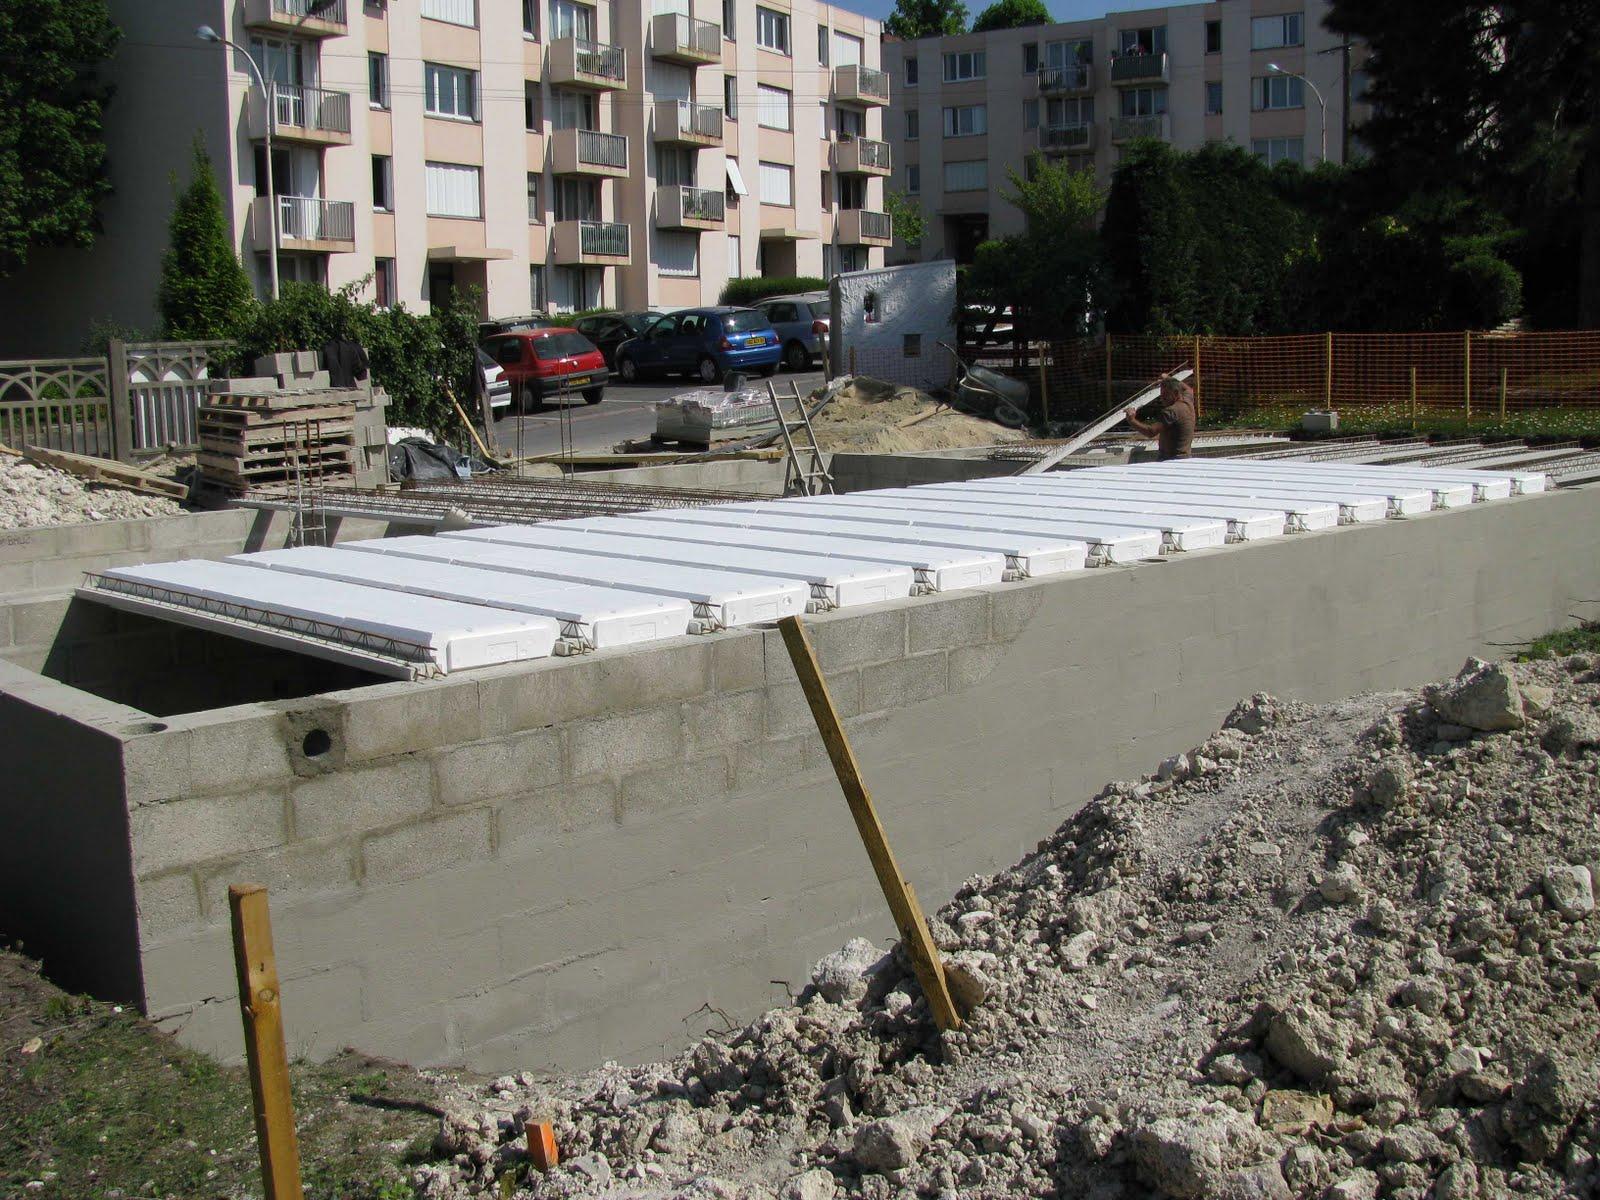 Je fais construire ma maison plancher 1 7 for Construire ma maison